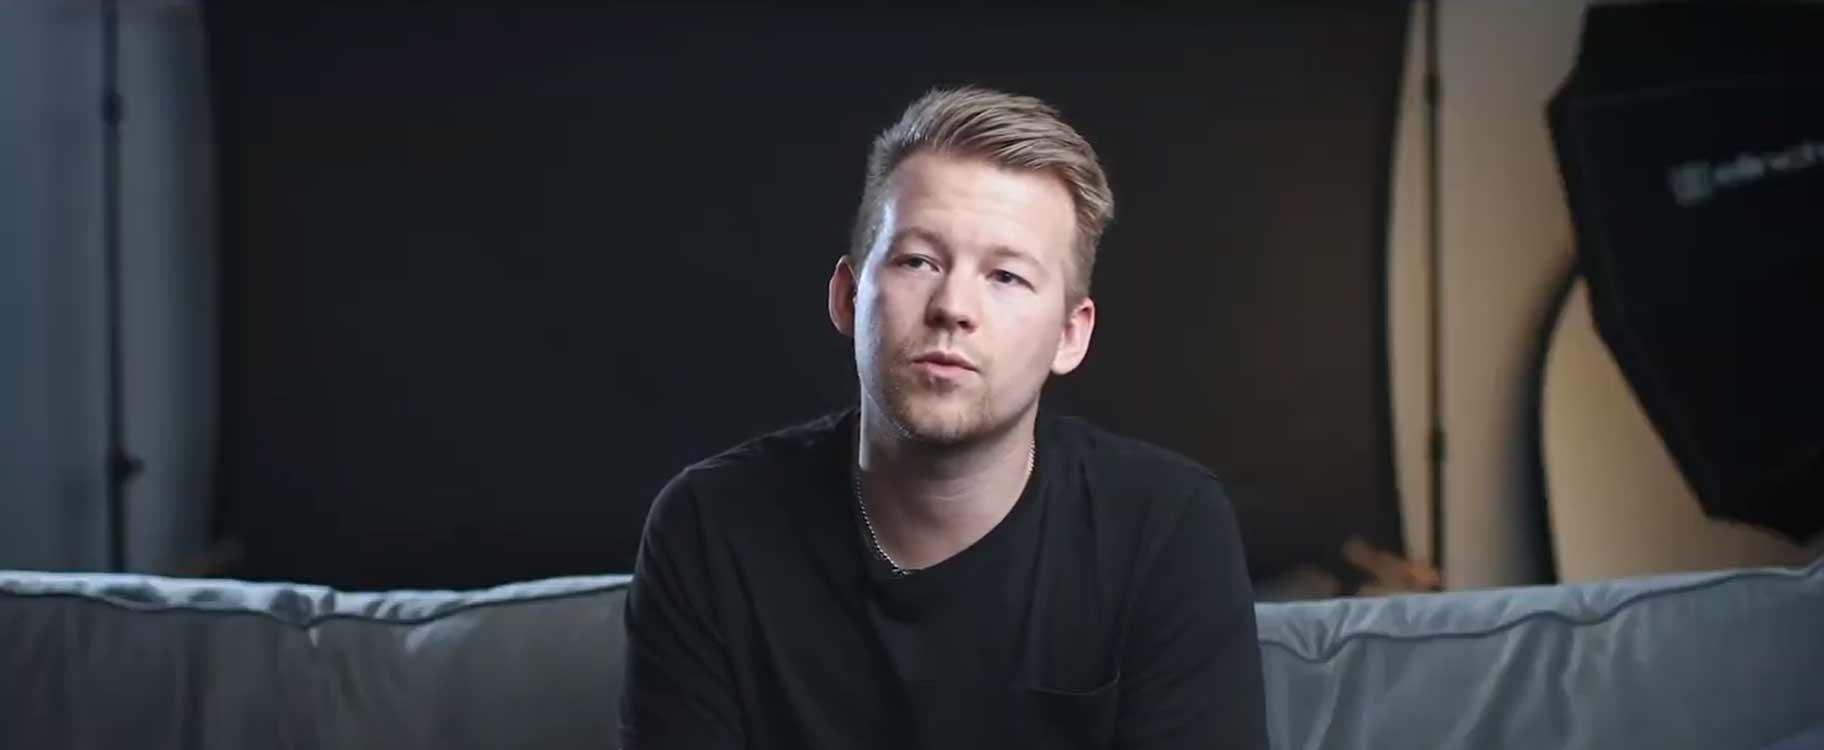 Fotorgraf i Mariestad, André Nordblom